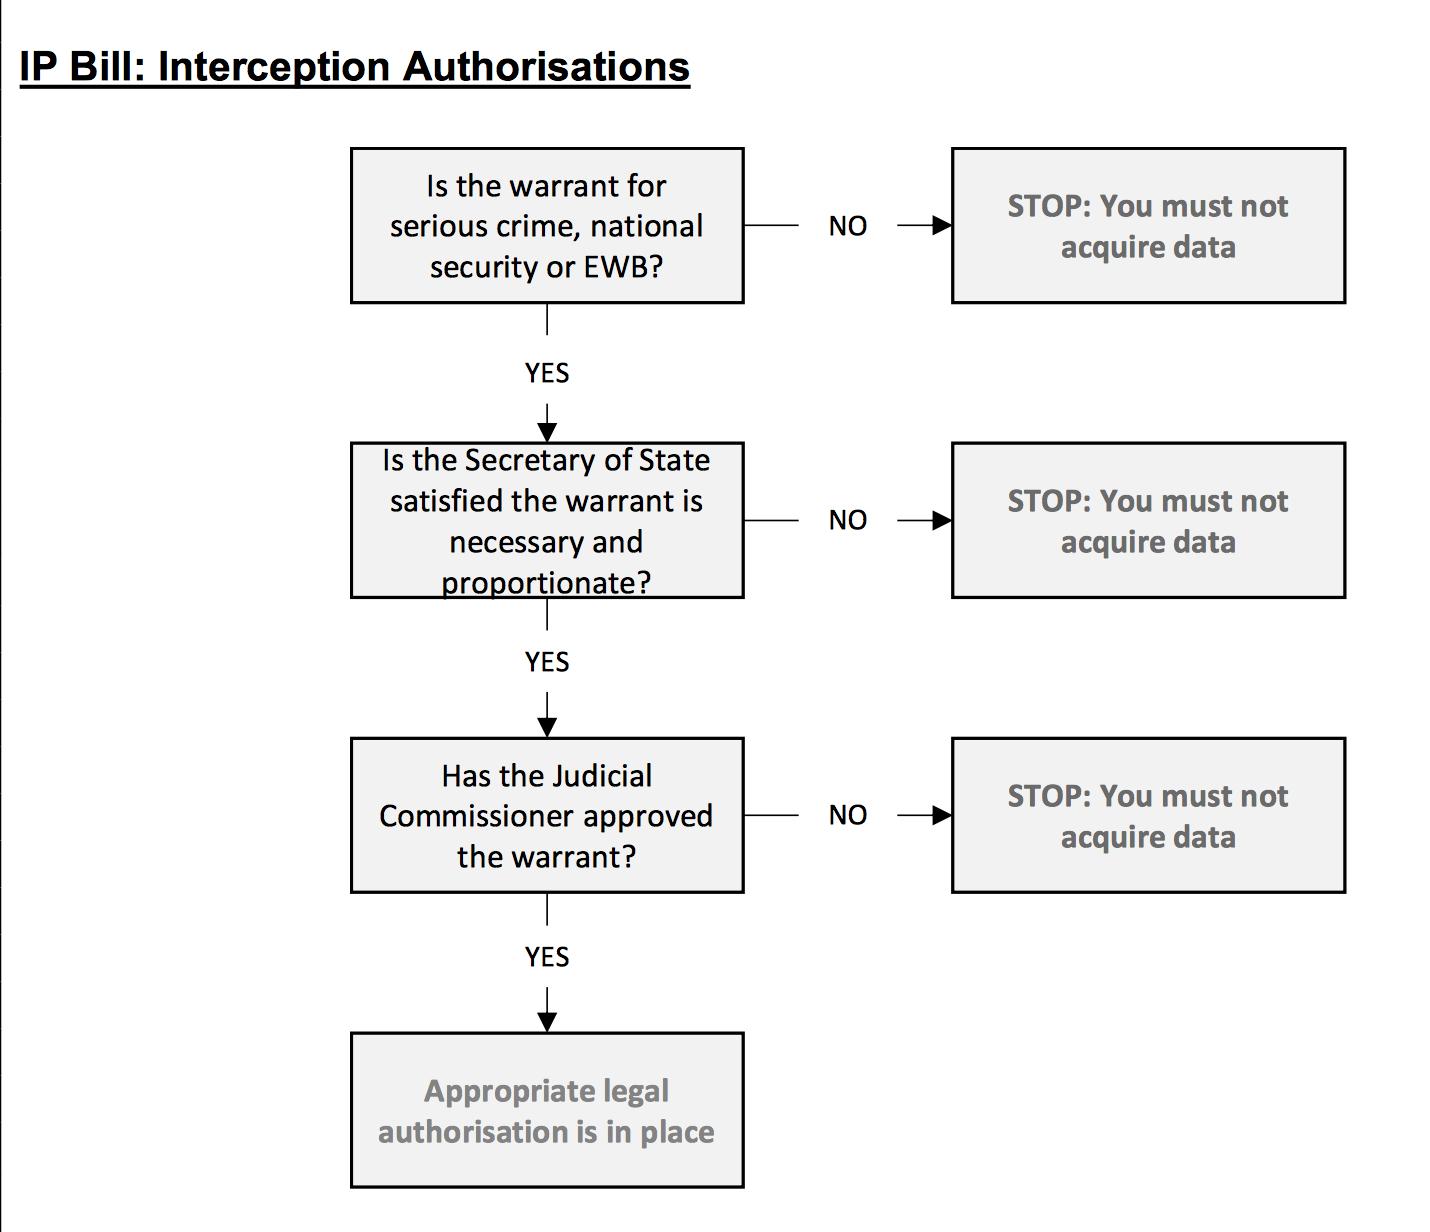 IP Bill Interception authorisations